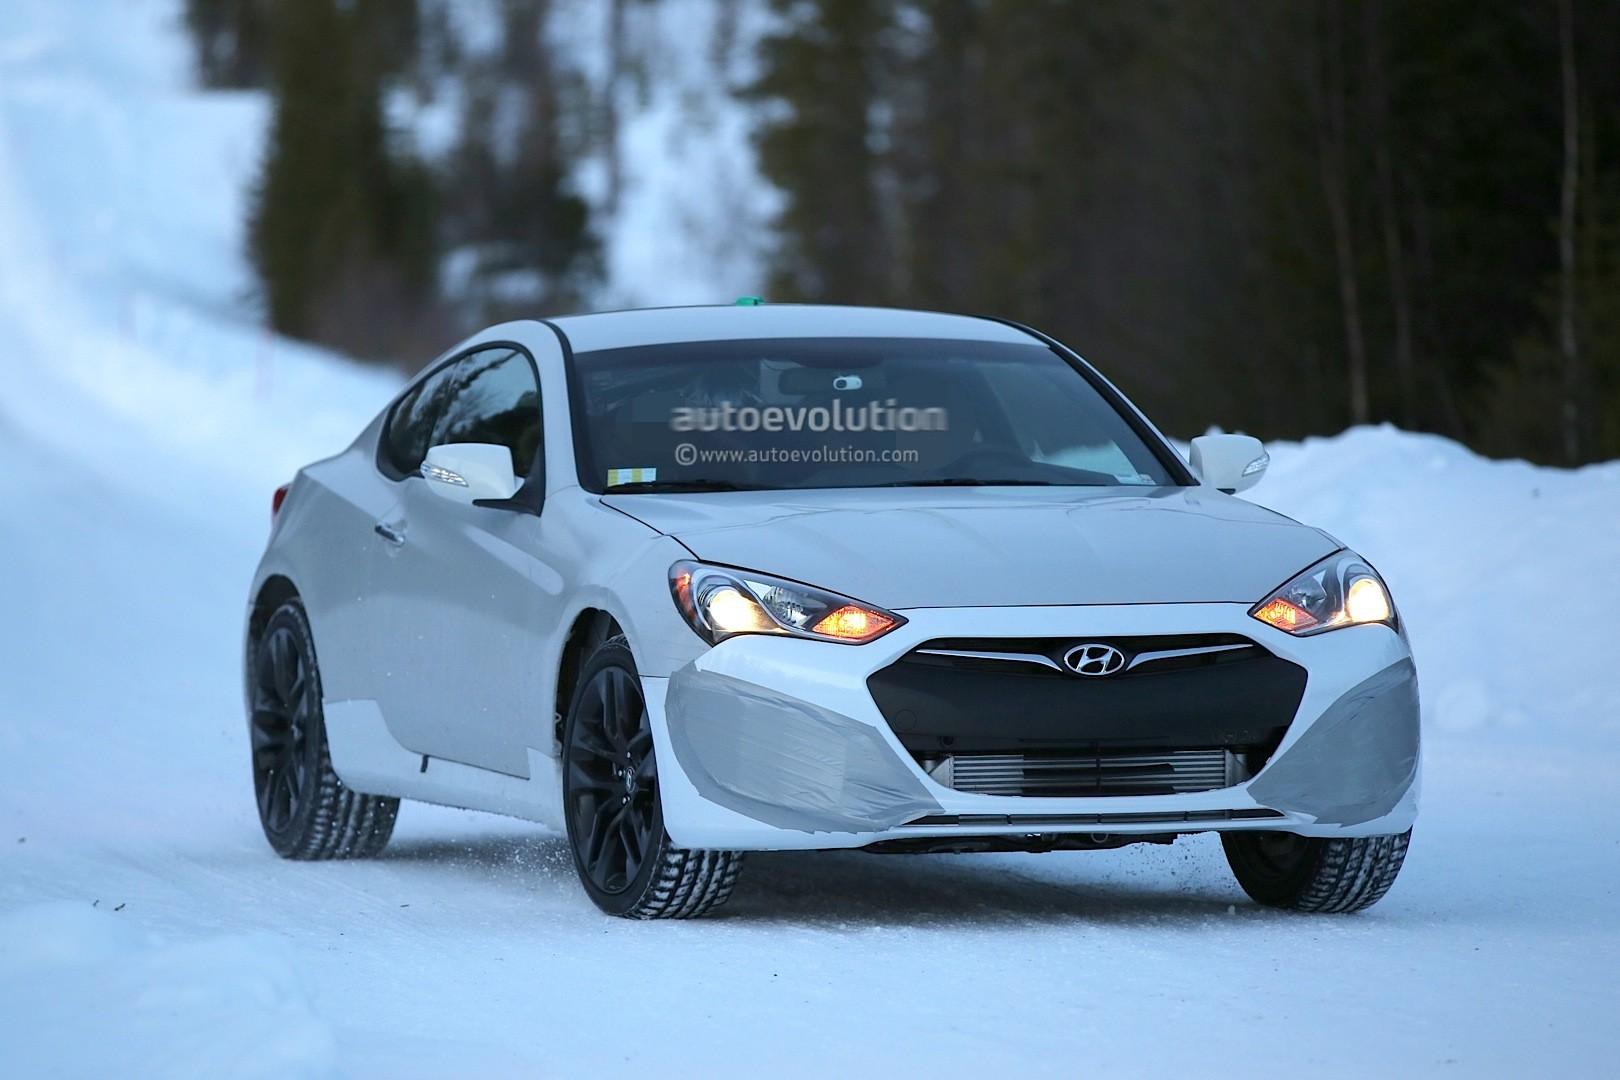 Spyshots 2017 Hyundai Genesis Coupe Mule Starts Winter